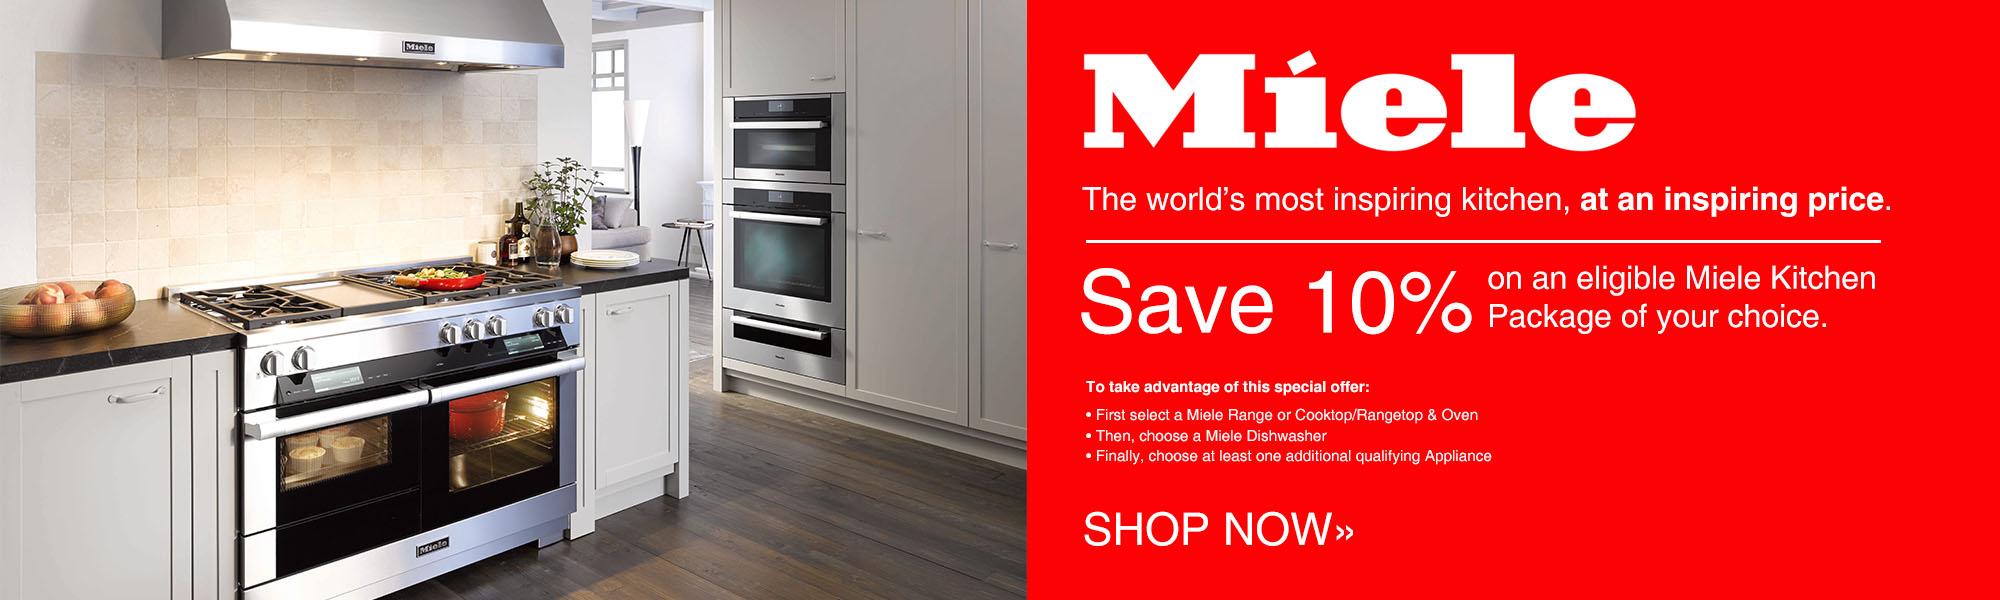 Uncategorized Kitchen Appliances San Francisco cherins appliance home appliances kitchen in san save 10 on select miele packages